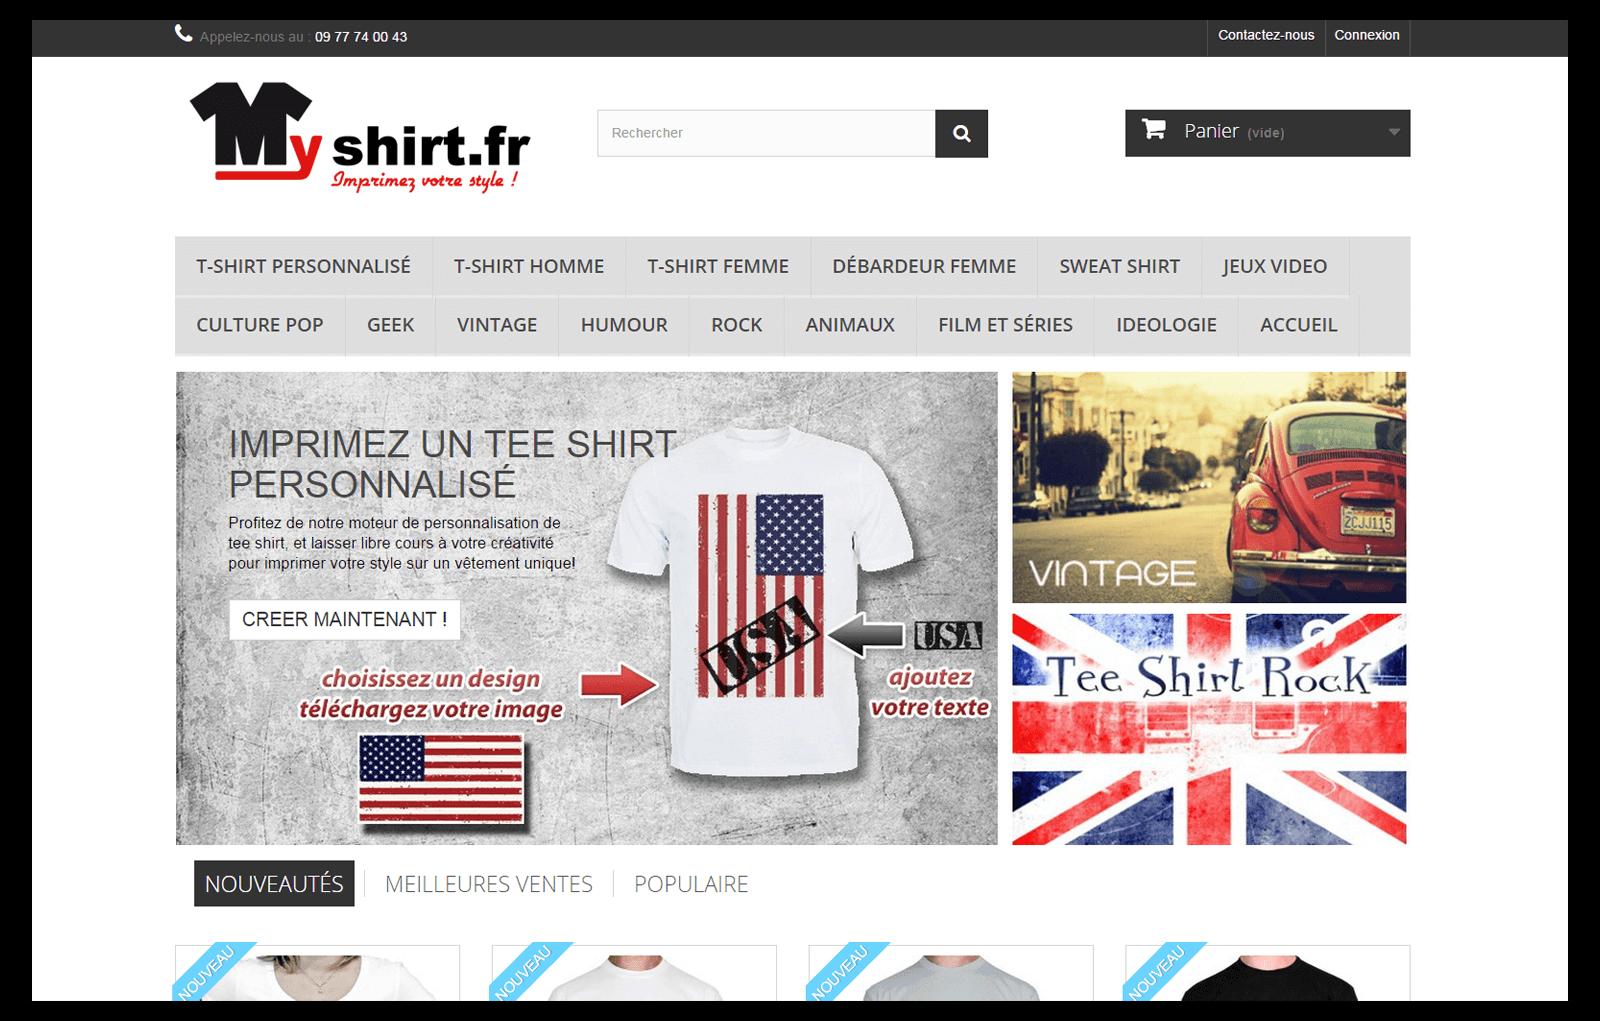 Personnalisation de t-shirt avec myshirt.fr